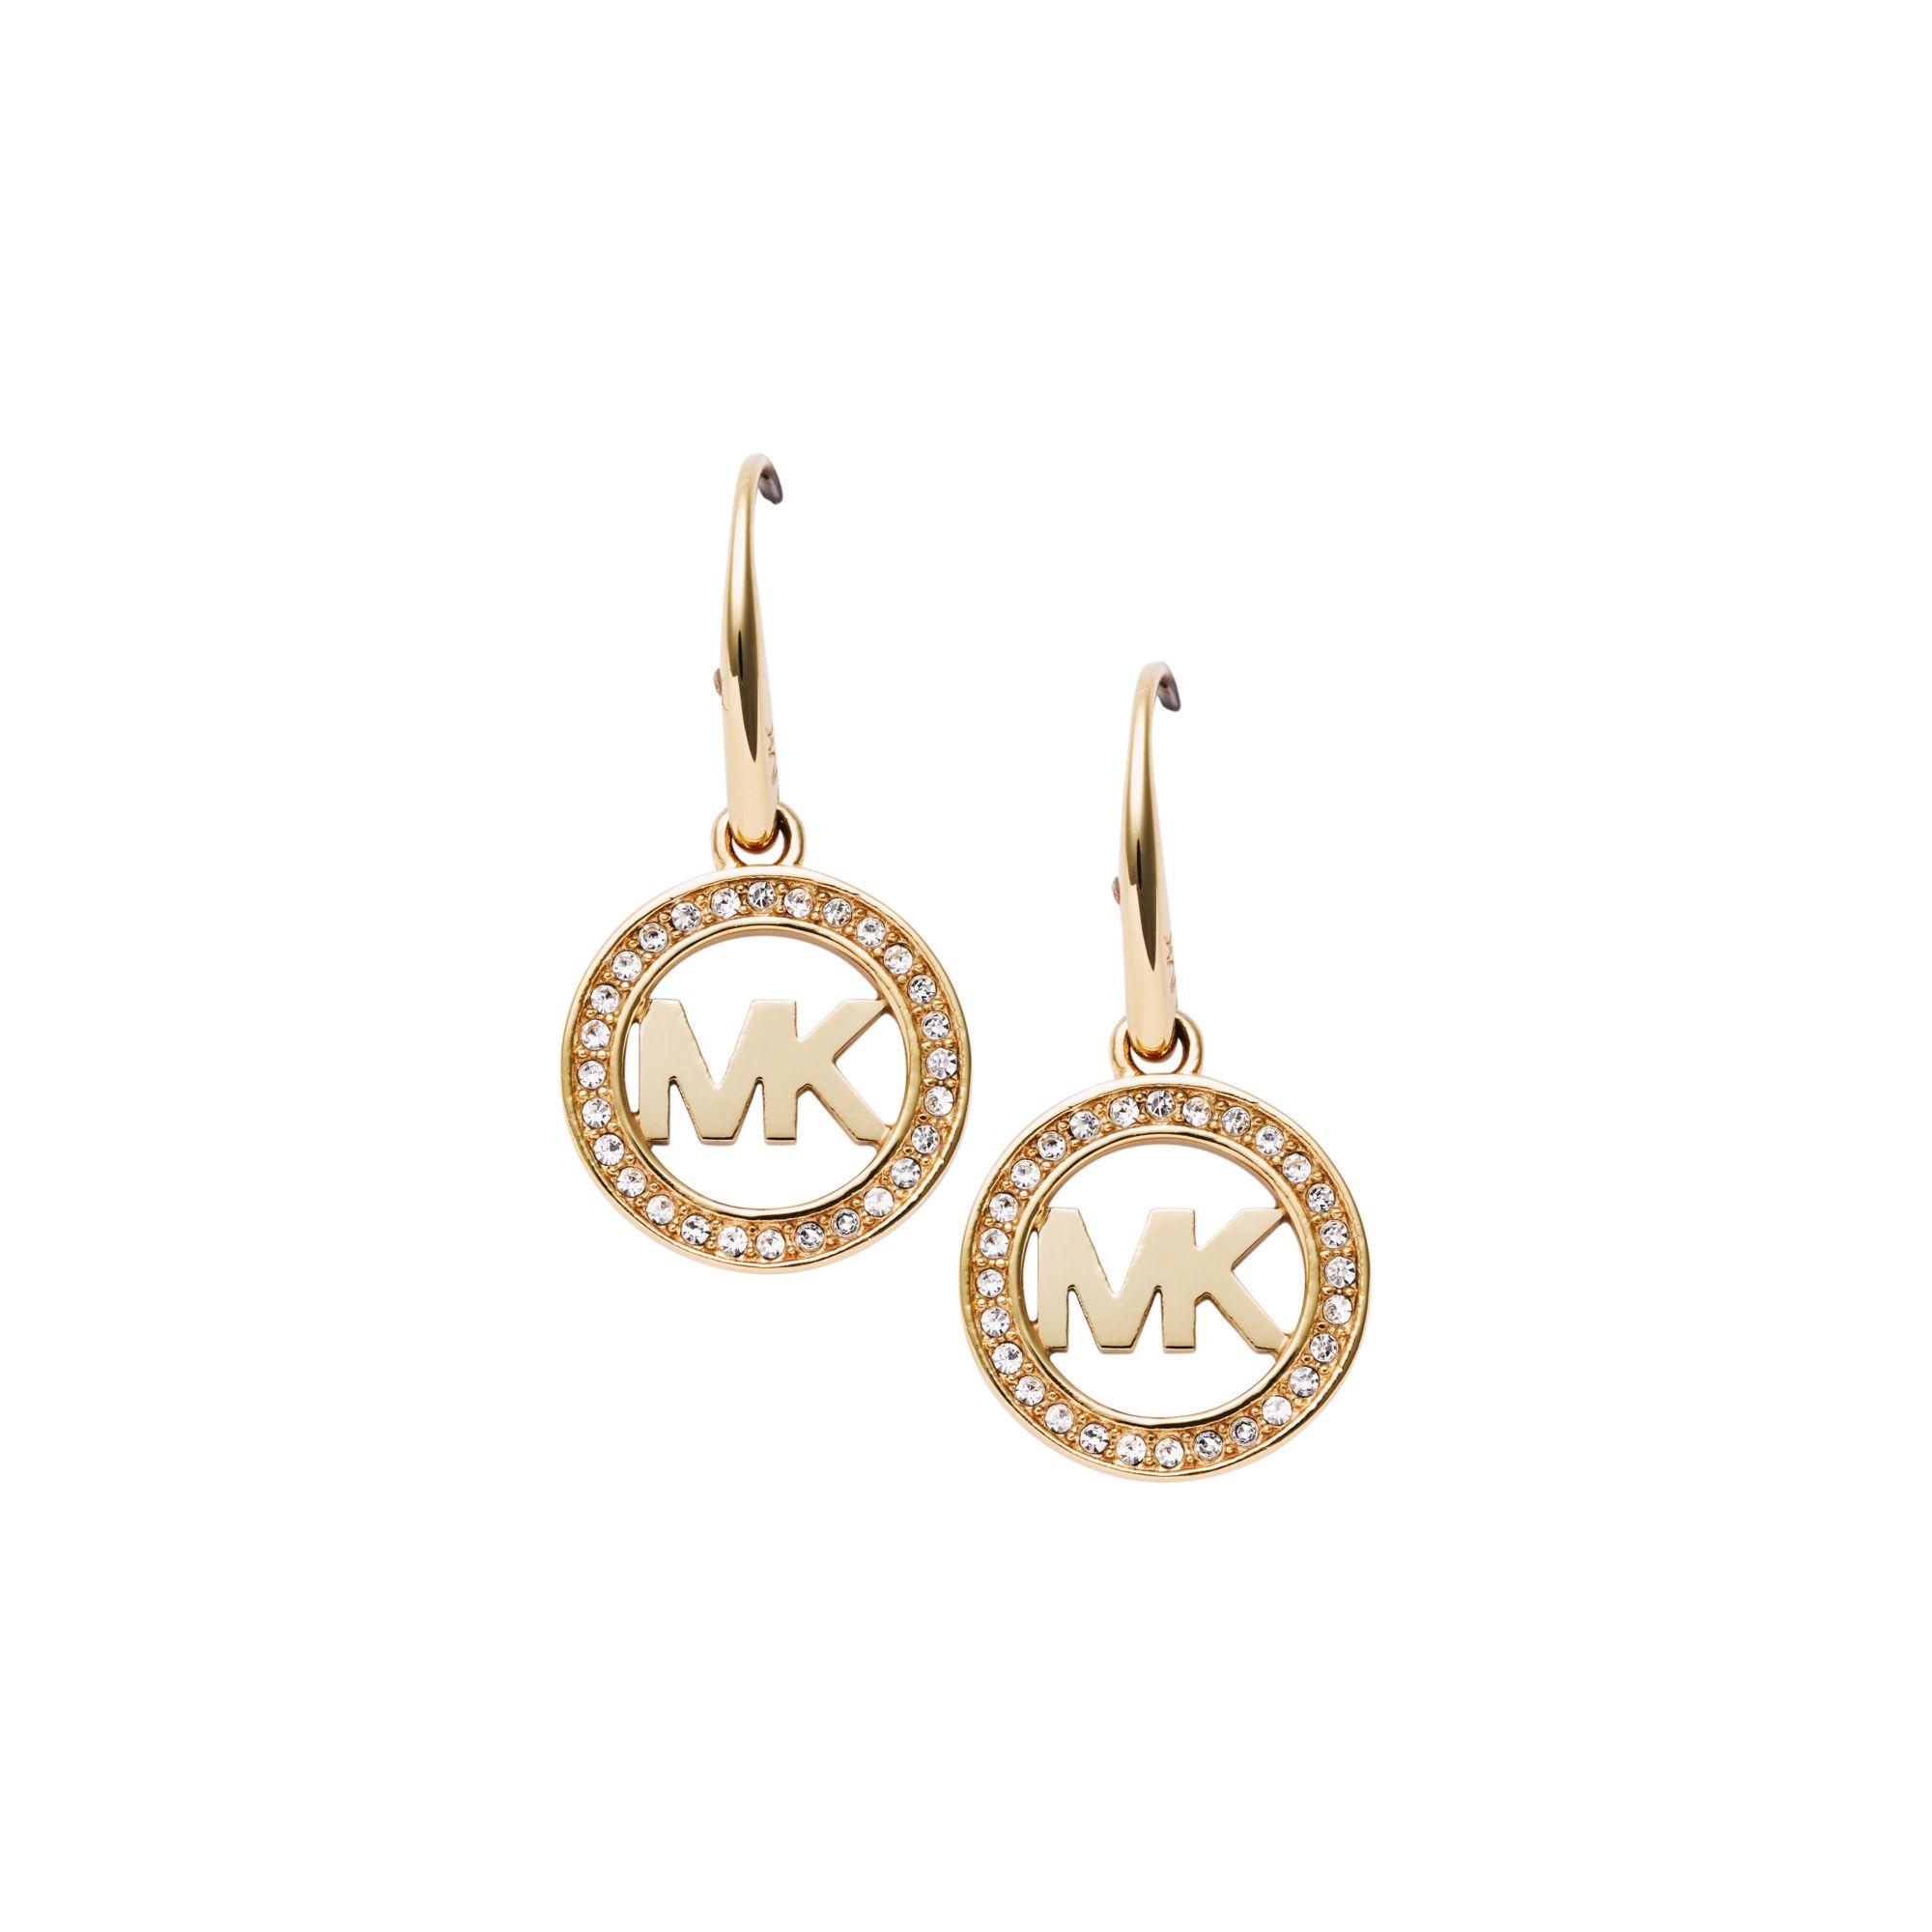 Lyst - Michael Kors Pavé Logo Gold-tone Earrings in Metallic 7bd41c7880